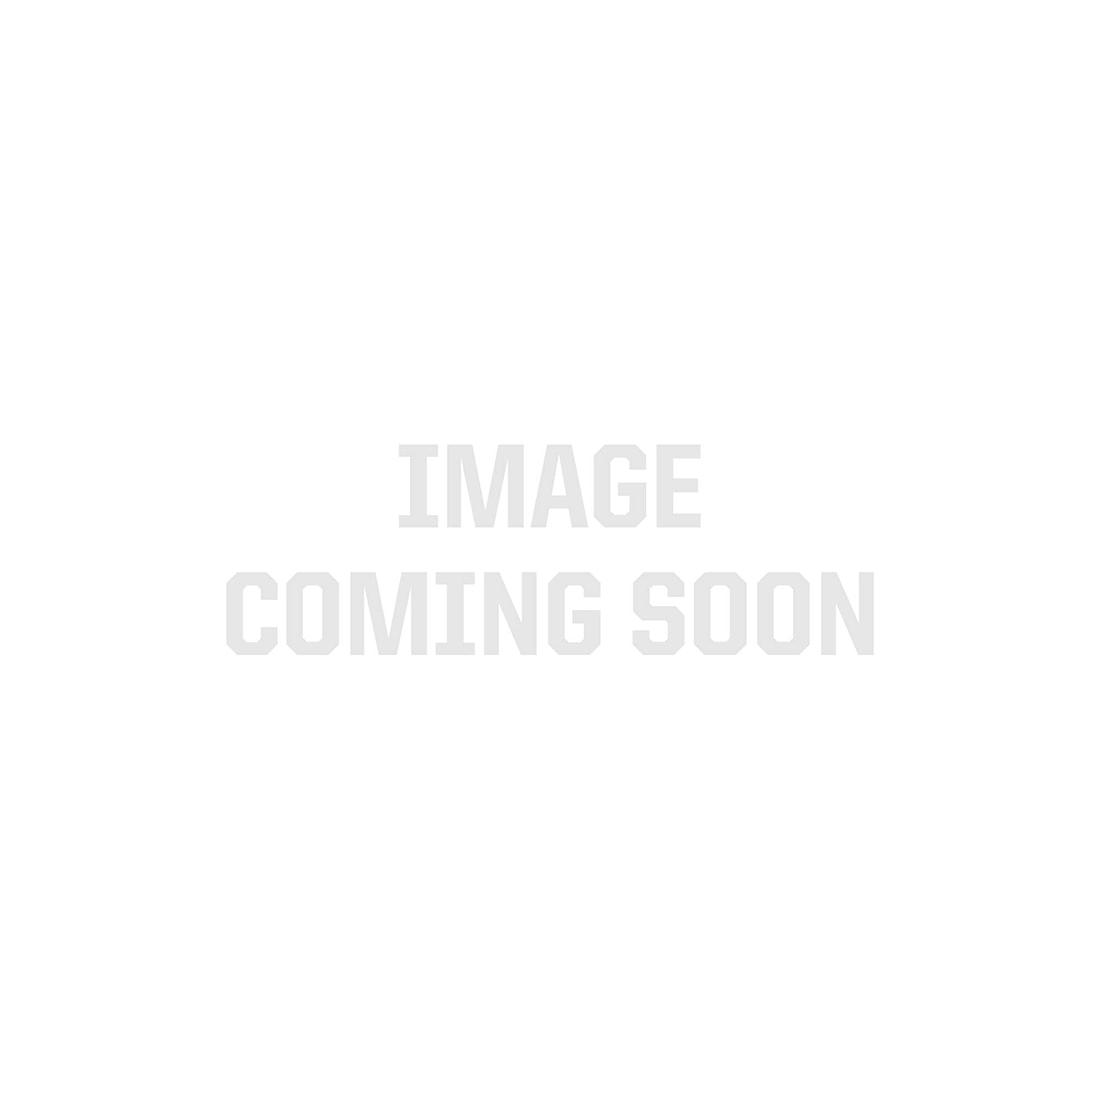 Green 5050 Single Row CurrentControl LED Strip Light, 60/m, 12mm wide, Sample Kit